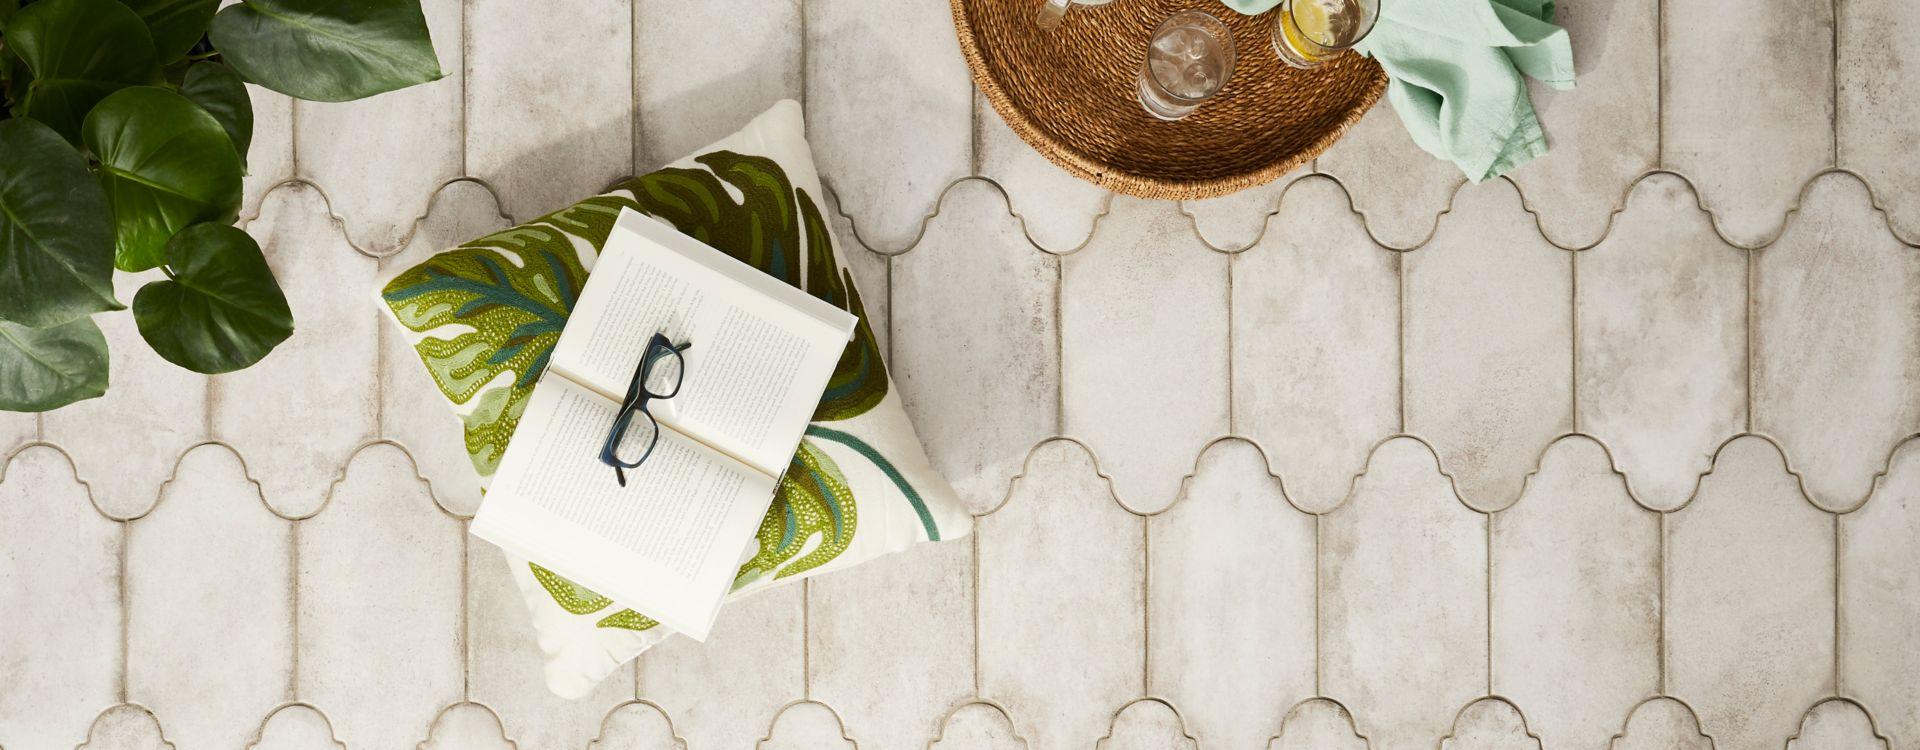 Outdoor Tile Design Ideas for 7 - The Tile Shop